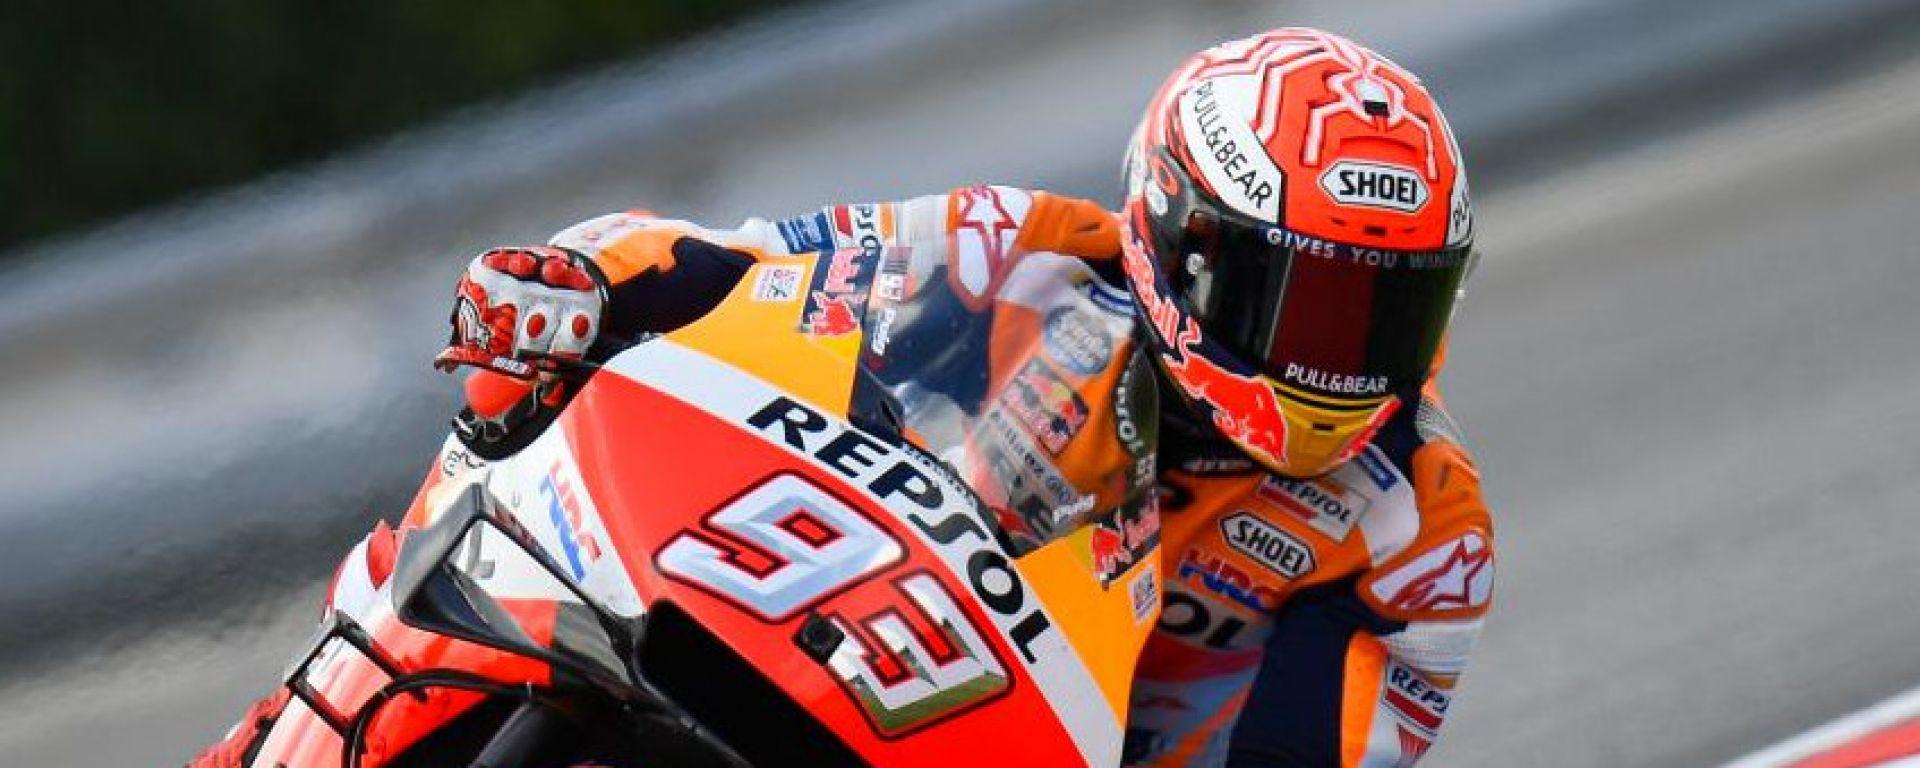 MotoGP Rep.Ceca, Qualifiche: straordinario Marquez in pole